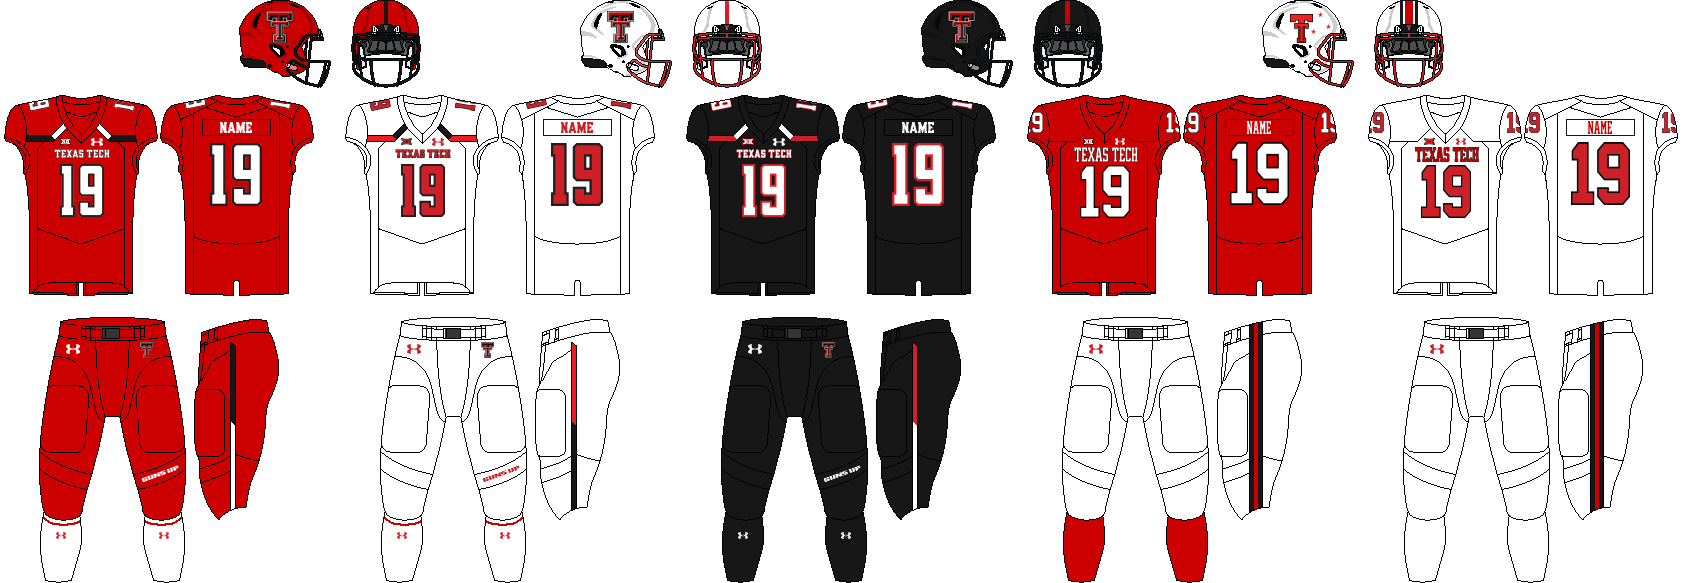 Texas Tech Red Raiders Football Wikipedia